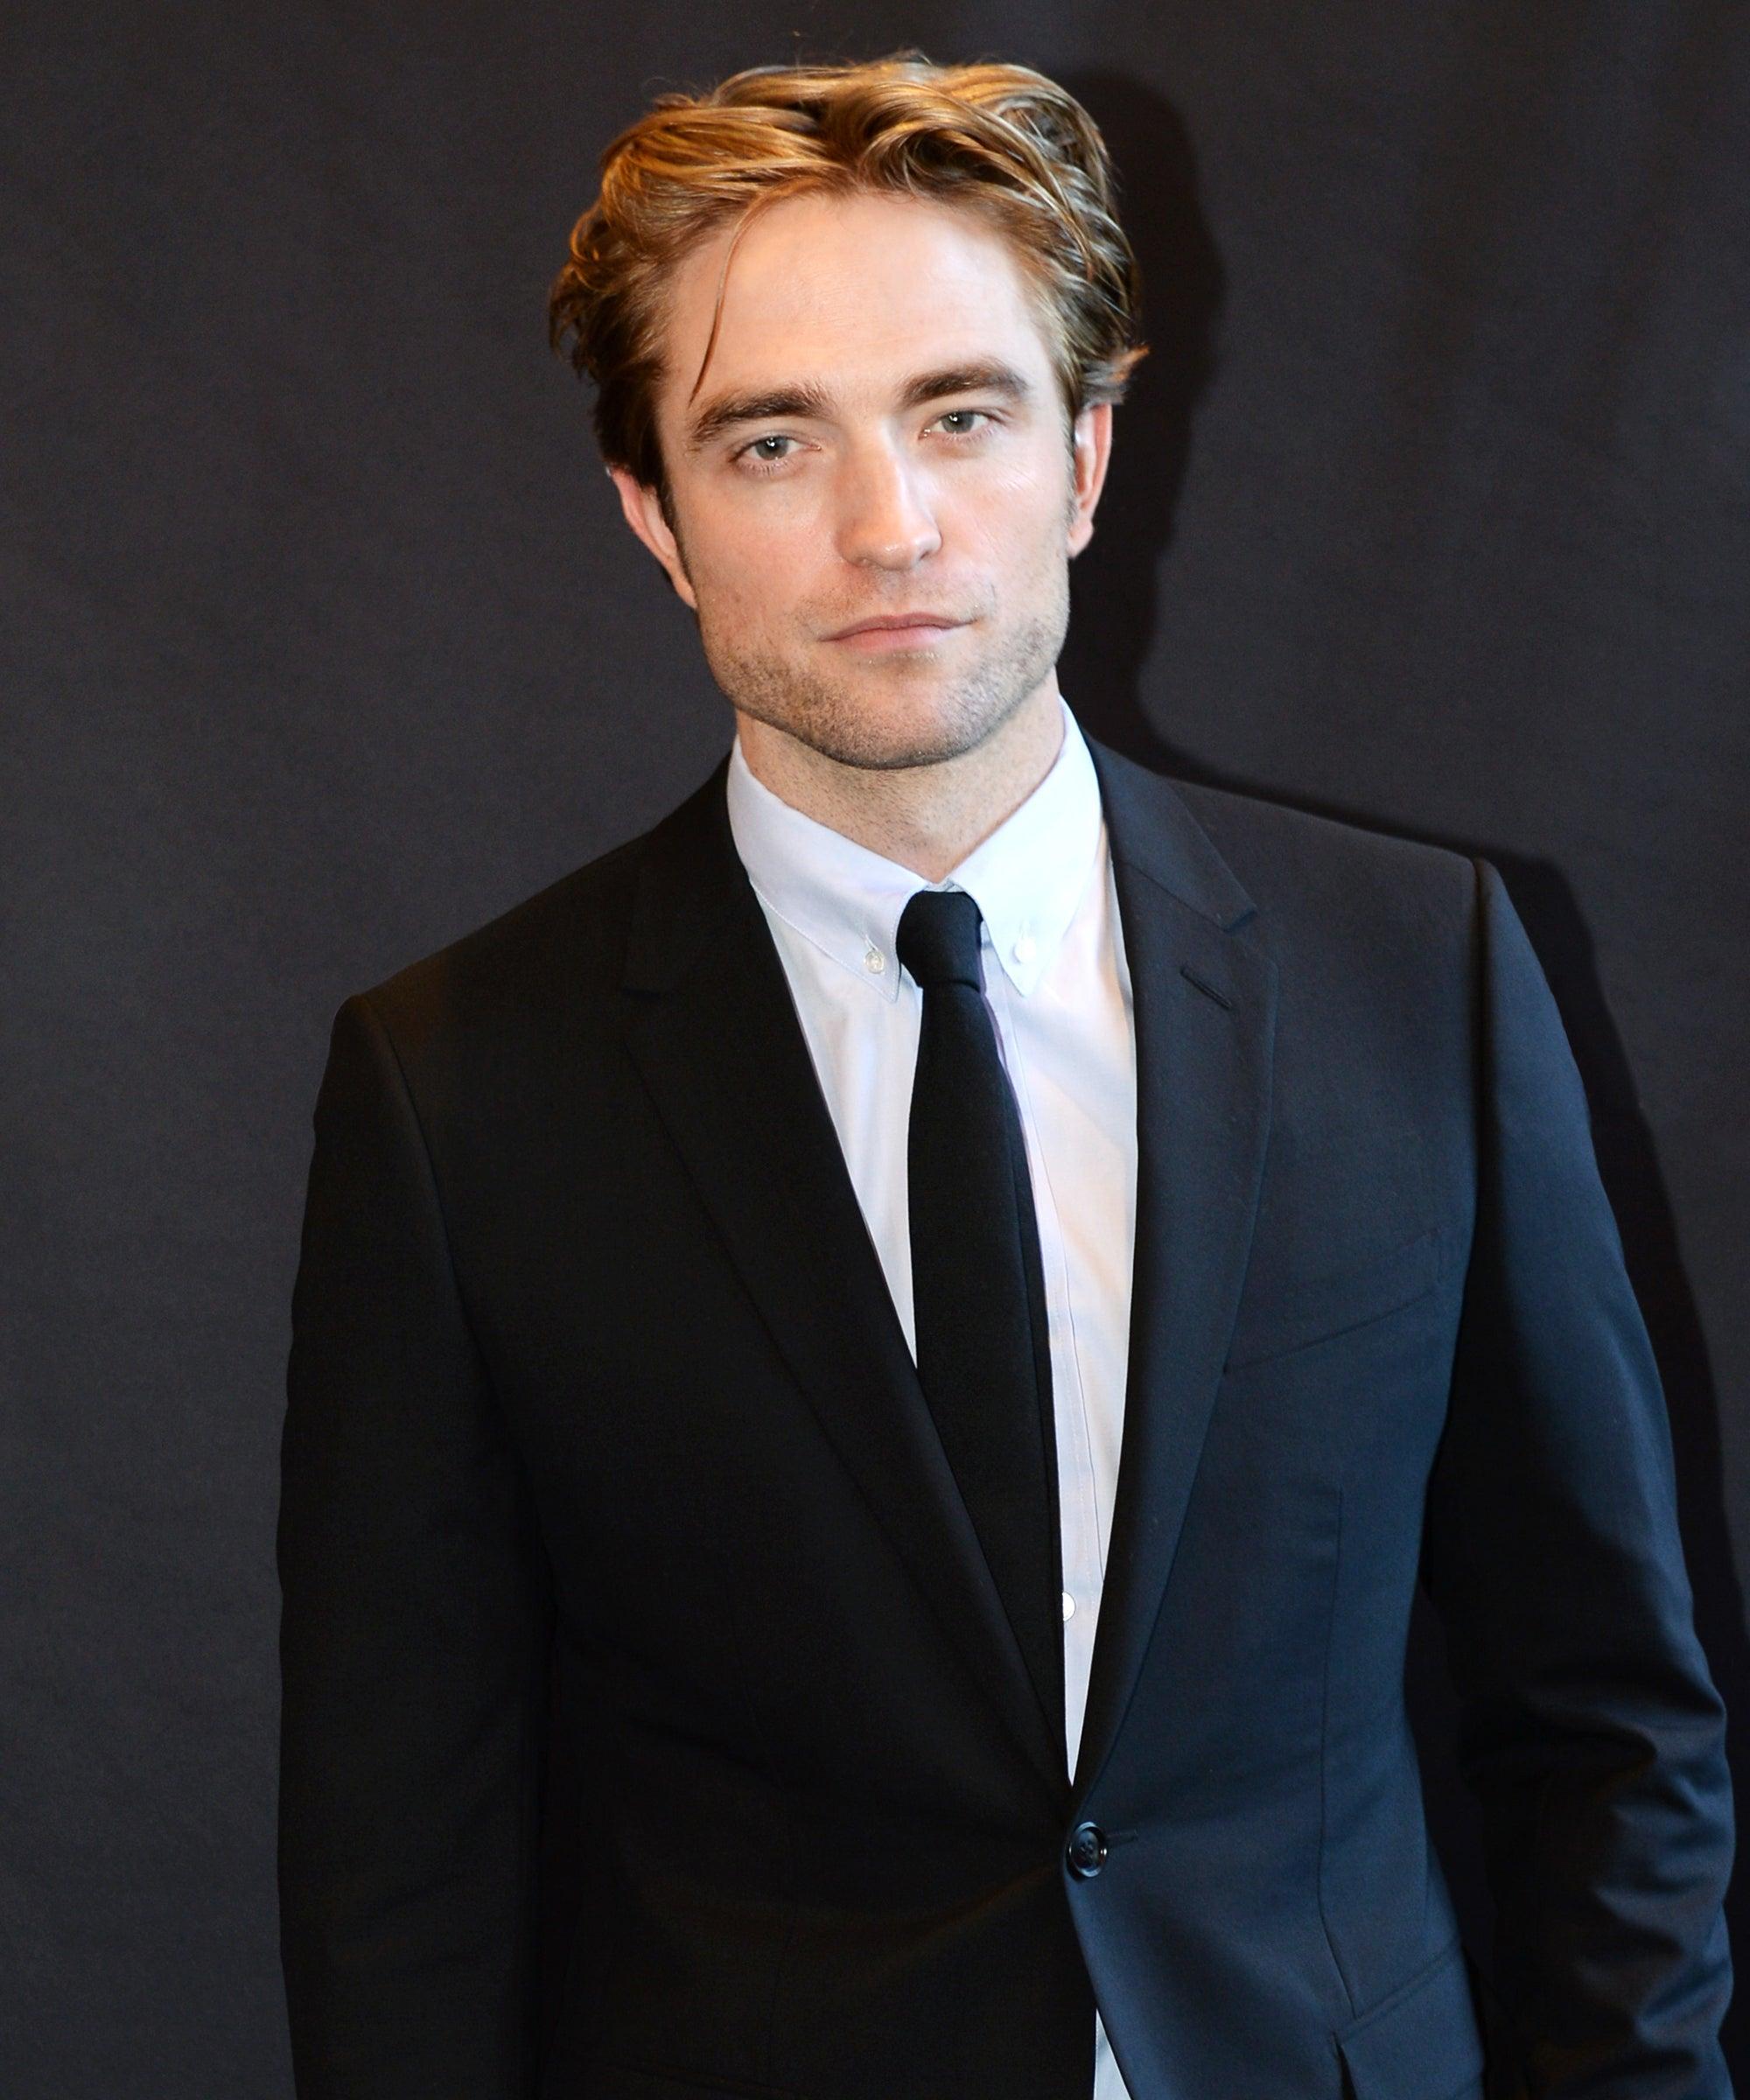 Robert Pattinson Was Not Shy About That Lighthouse Masturbation Scene